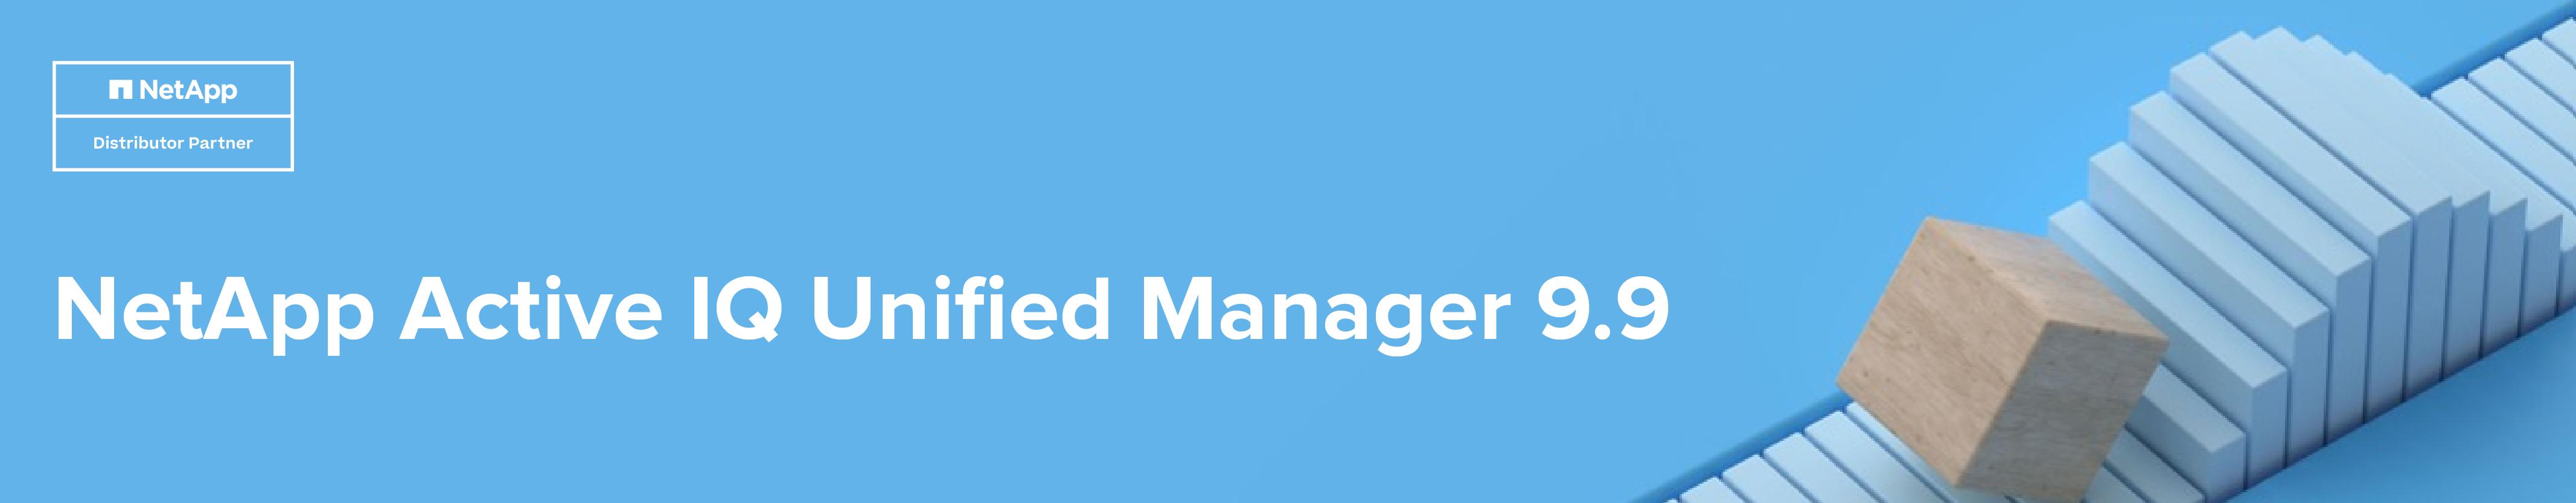 ALEF NetApp Active IQ Manager 9.9